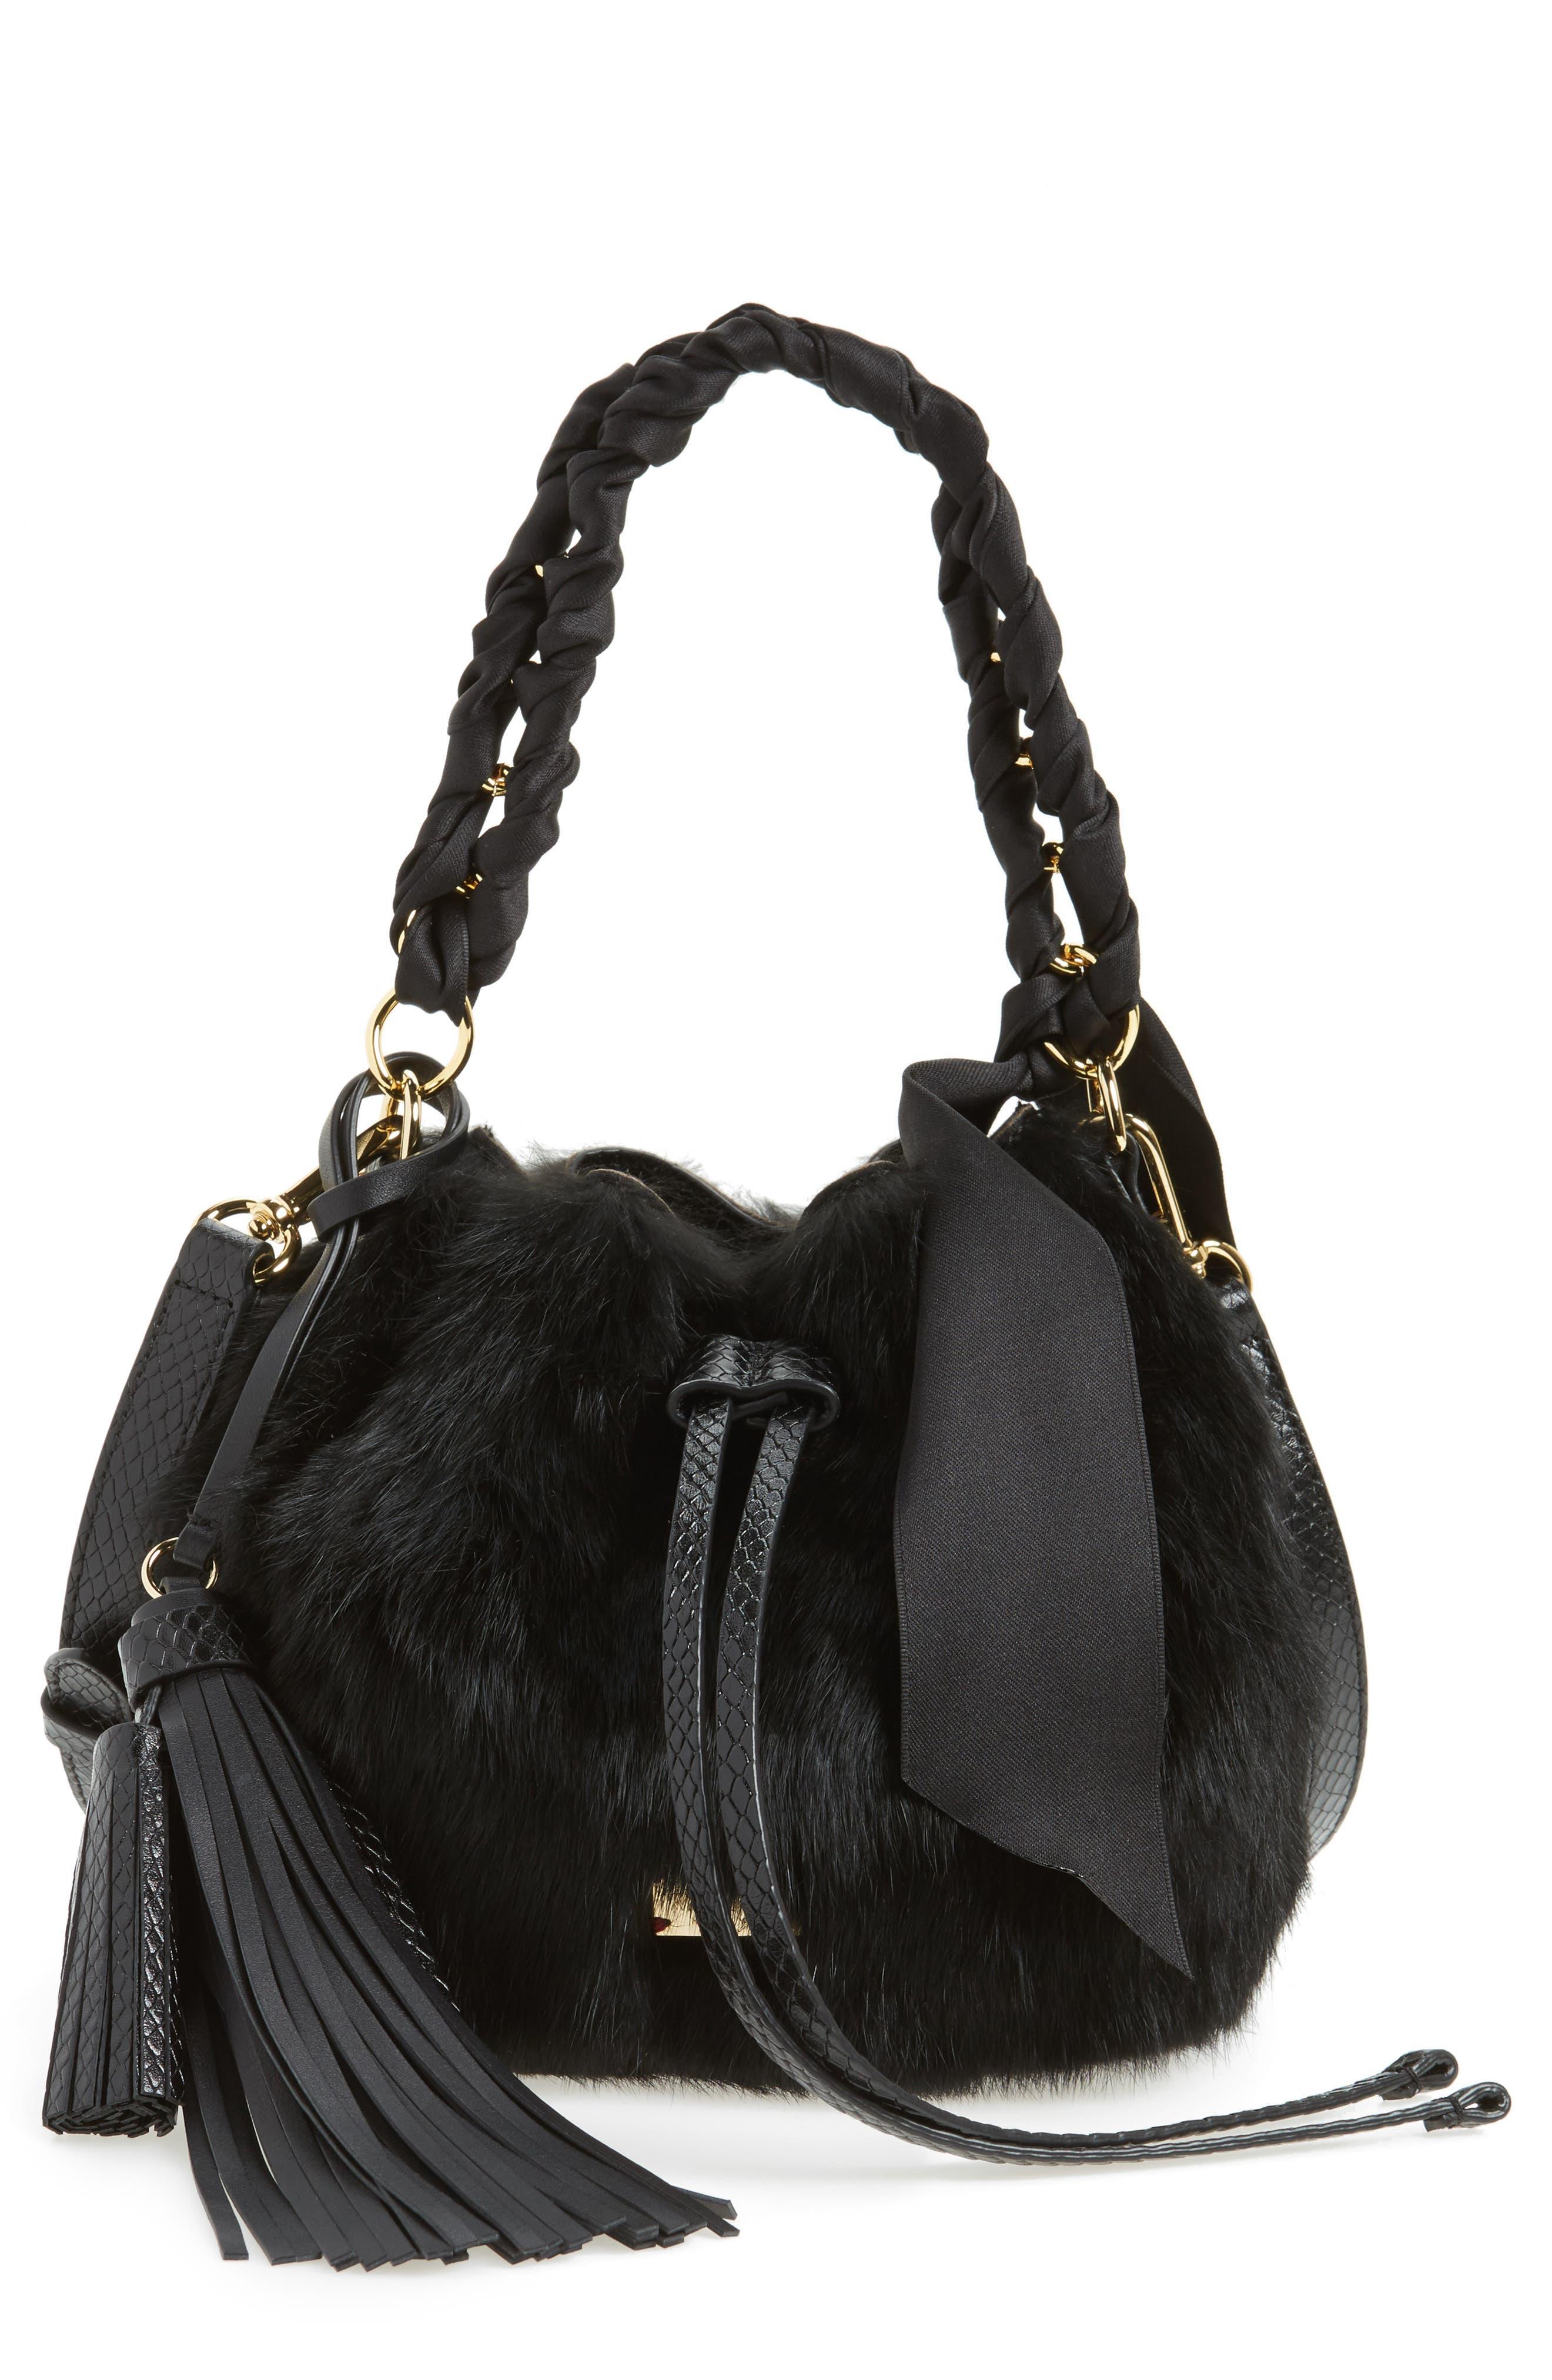 Frances Valentine Small Genuine Rabbit Fur & Leather Bucket Bag